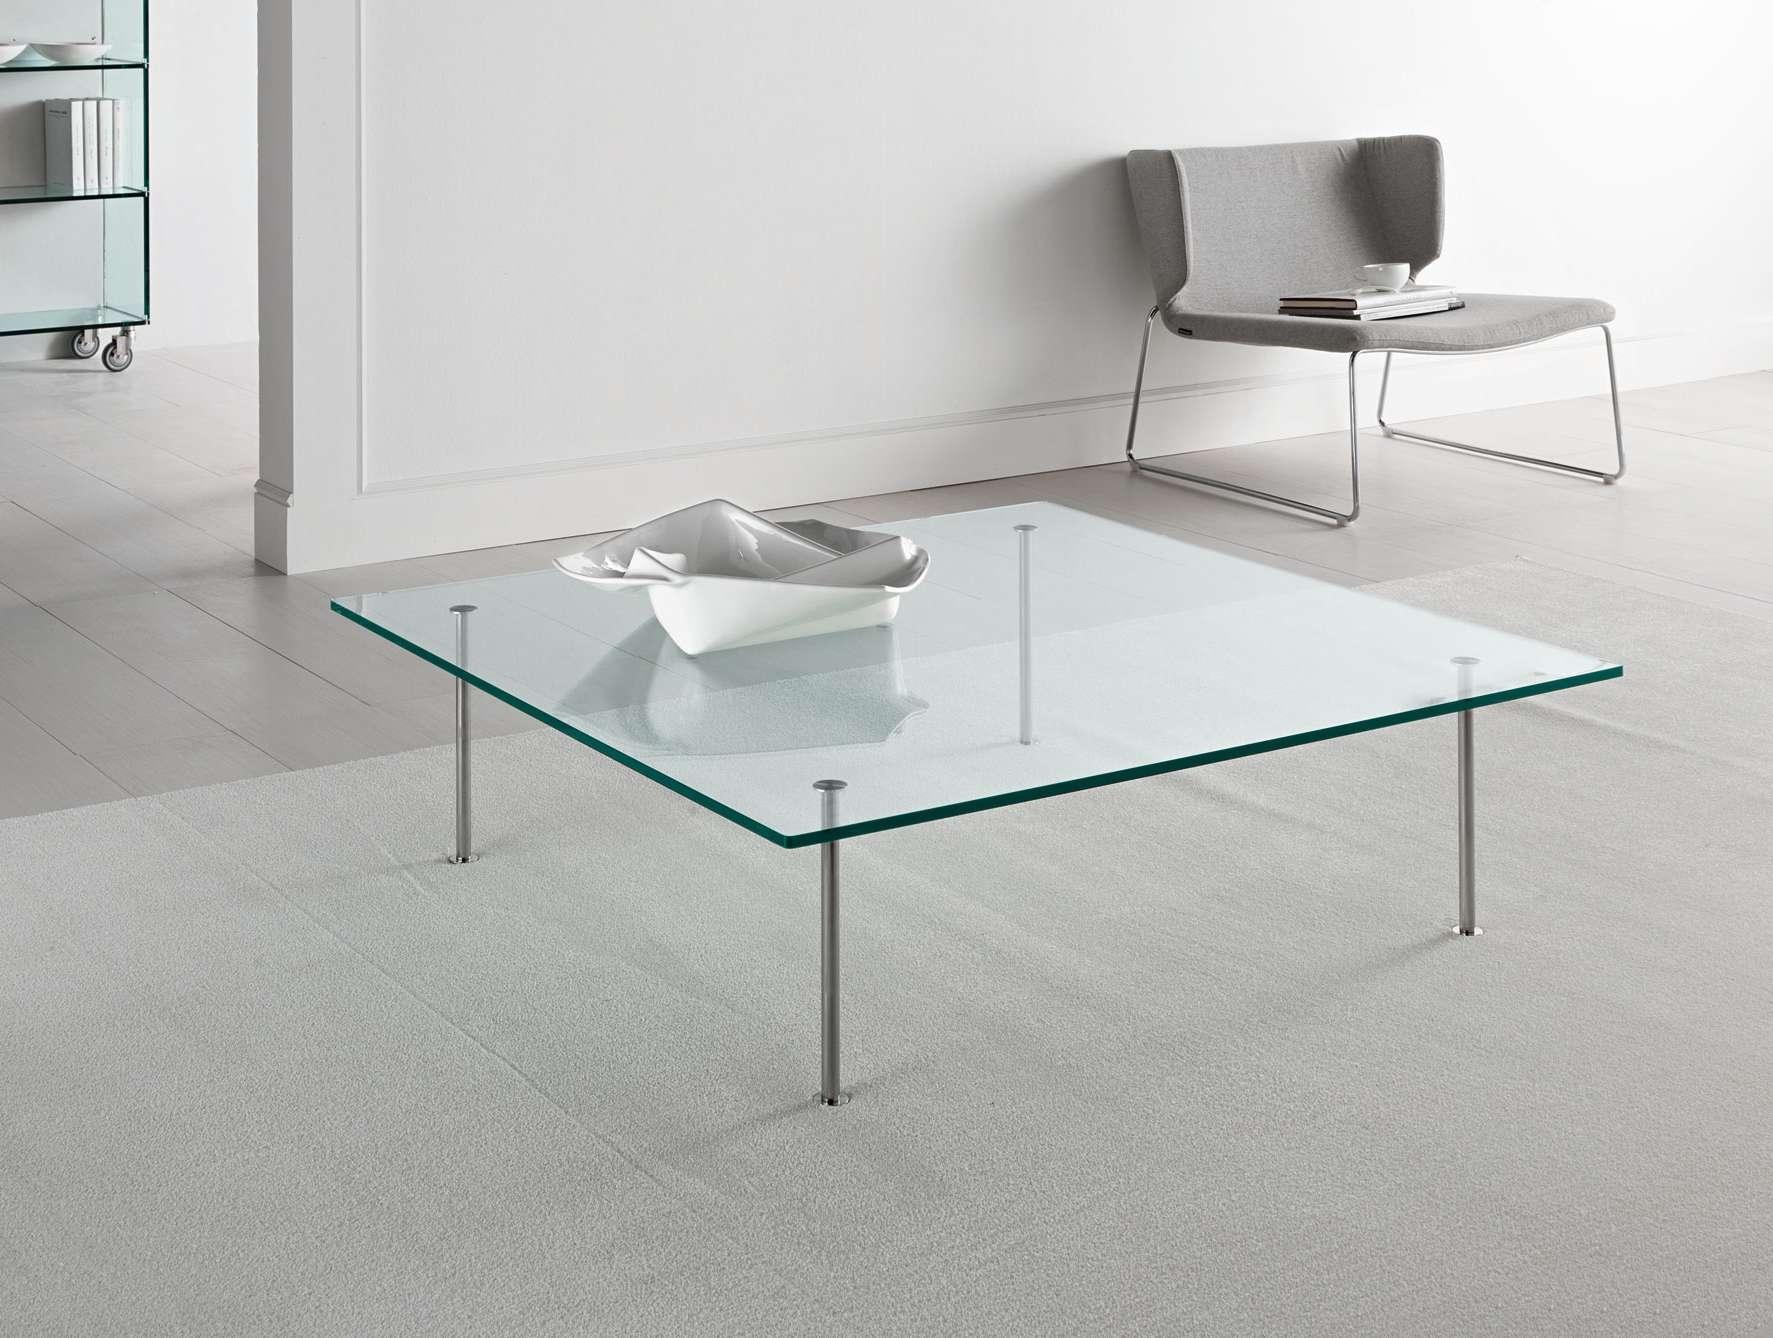 2017 Large Square Glass Coffee Tables With Nella Vetrina Tonelli Twig Modular Italian Square Coffee Table (View 6 of 20)